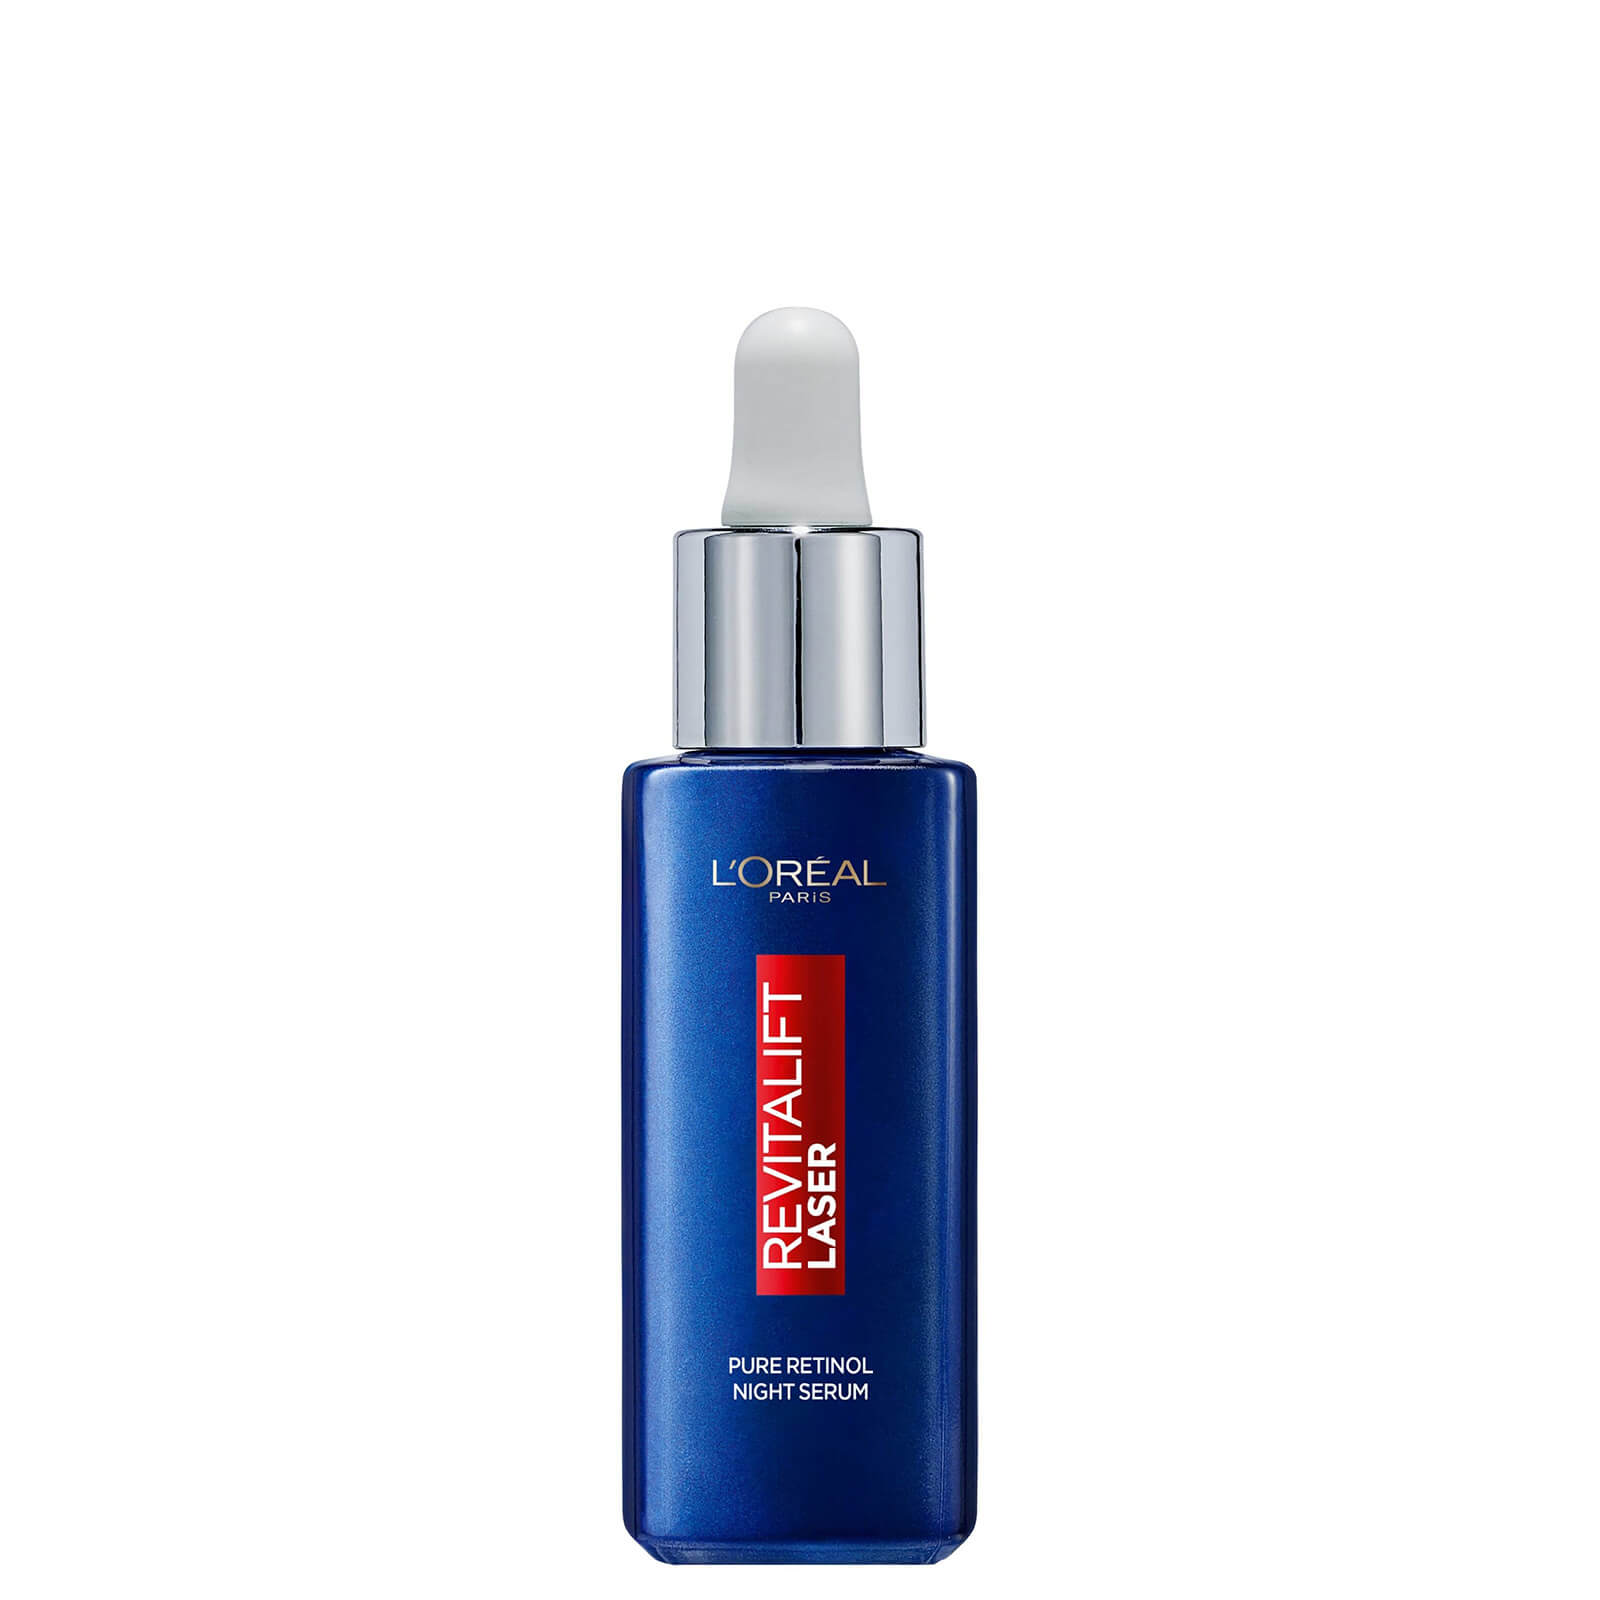 L'Oréal Paris Revitalift Laser Pure Retinol Deep Anti-Wrinkle Night Serum 30ml